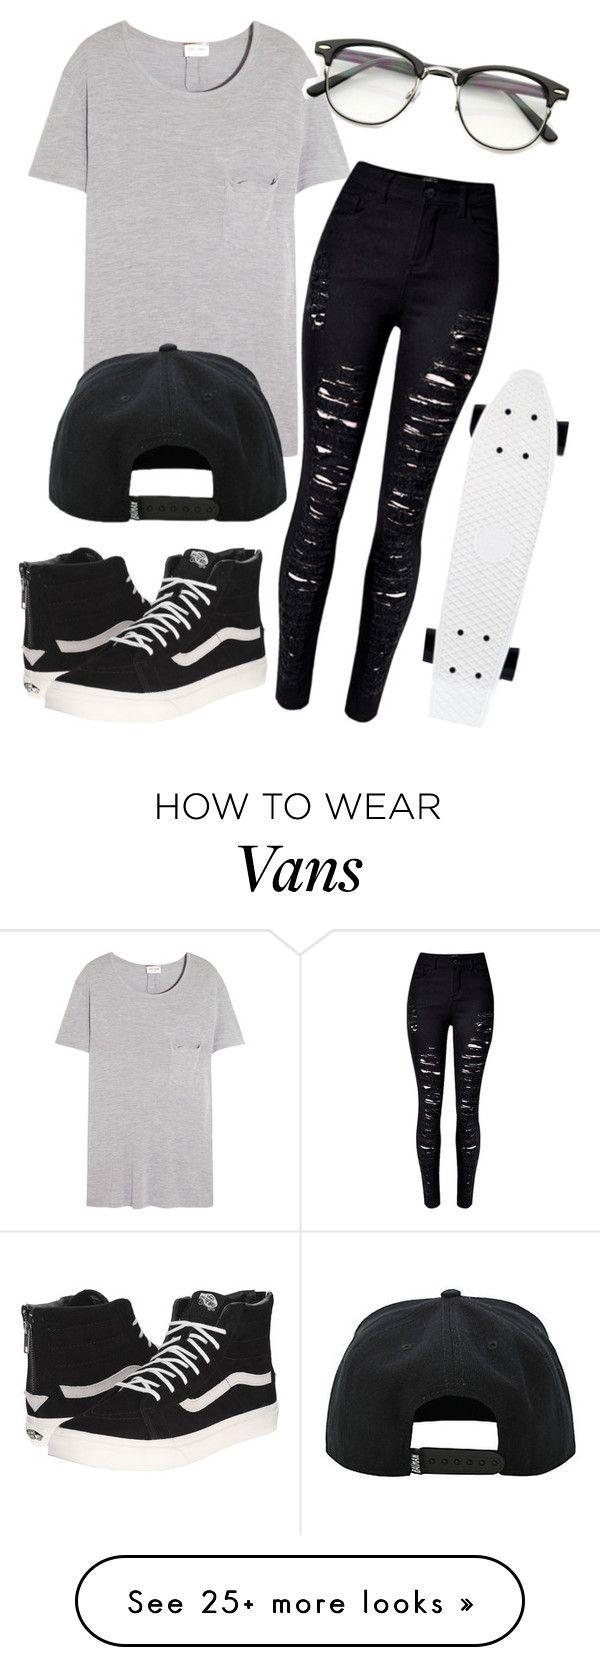 Black outfit: Camiseta básica + jeans rotos + Vans + penny + gorra